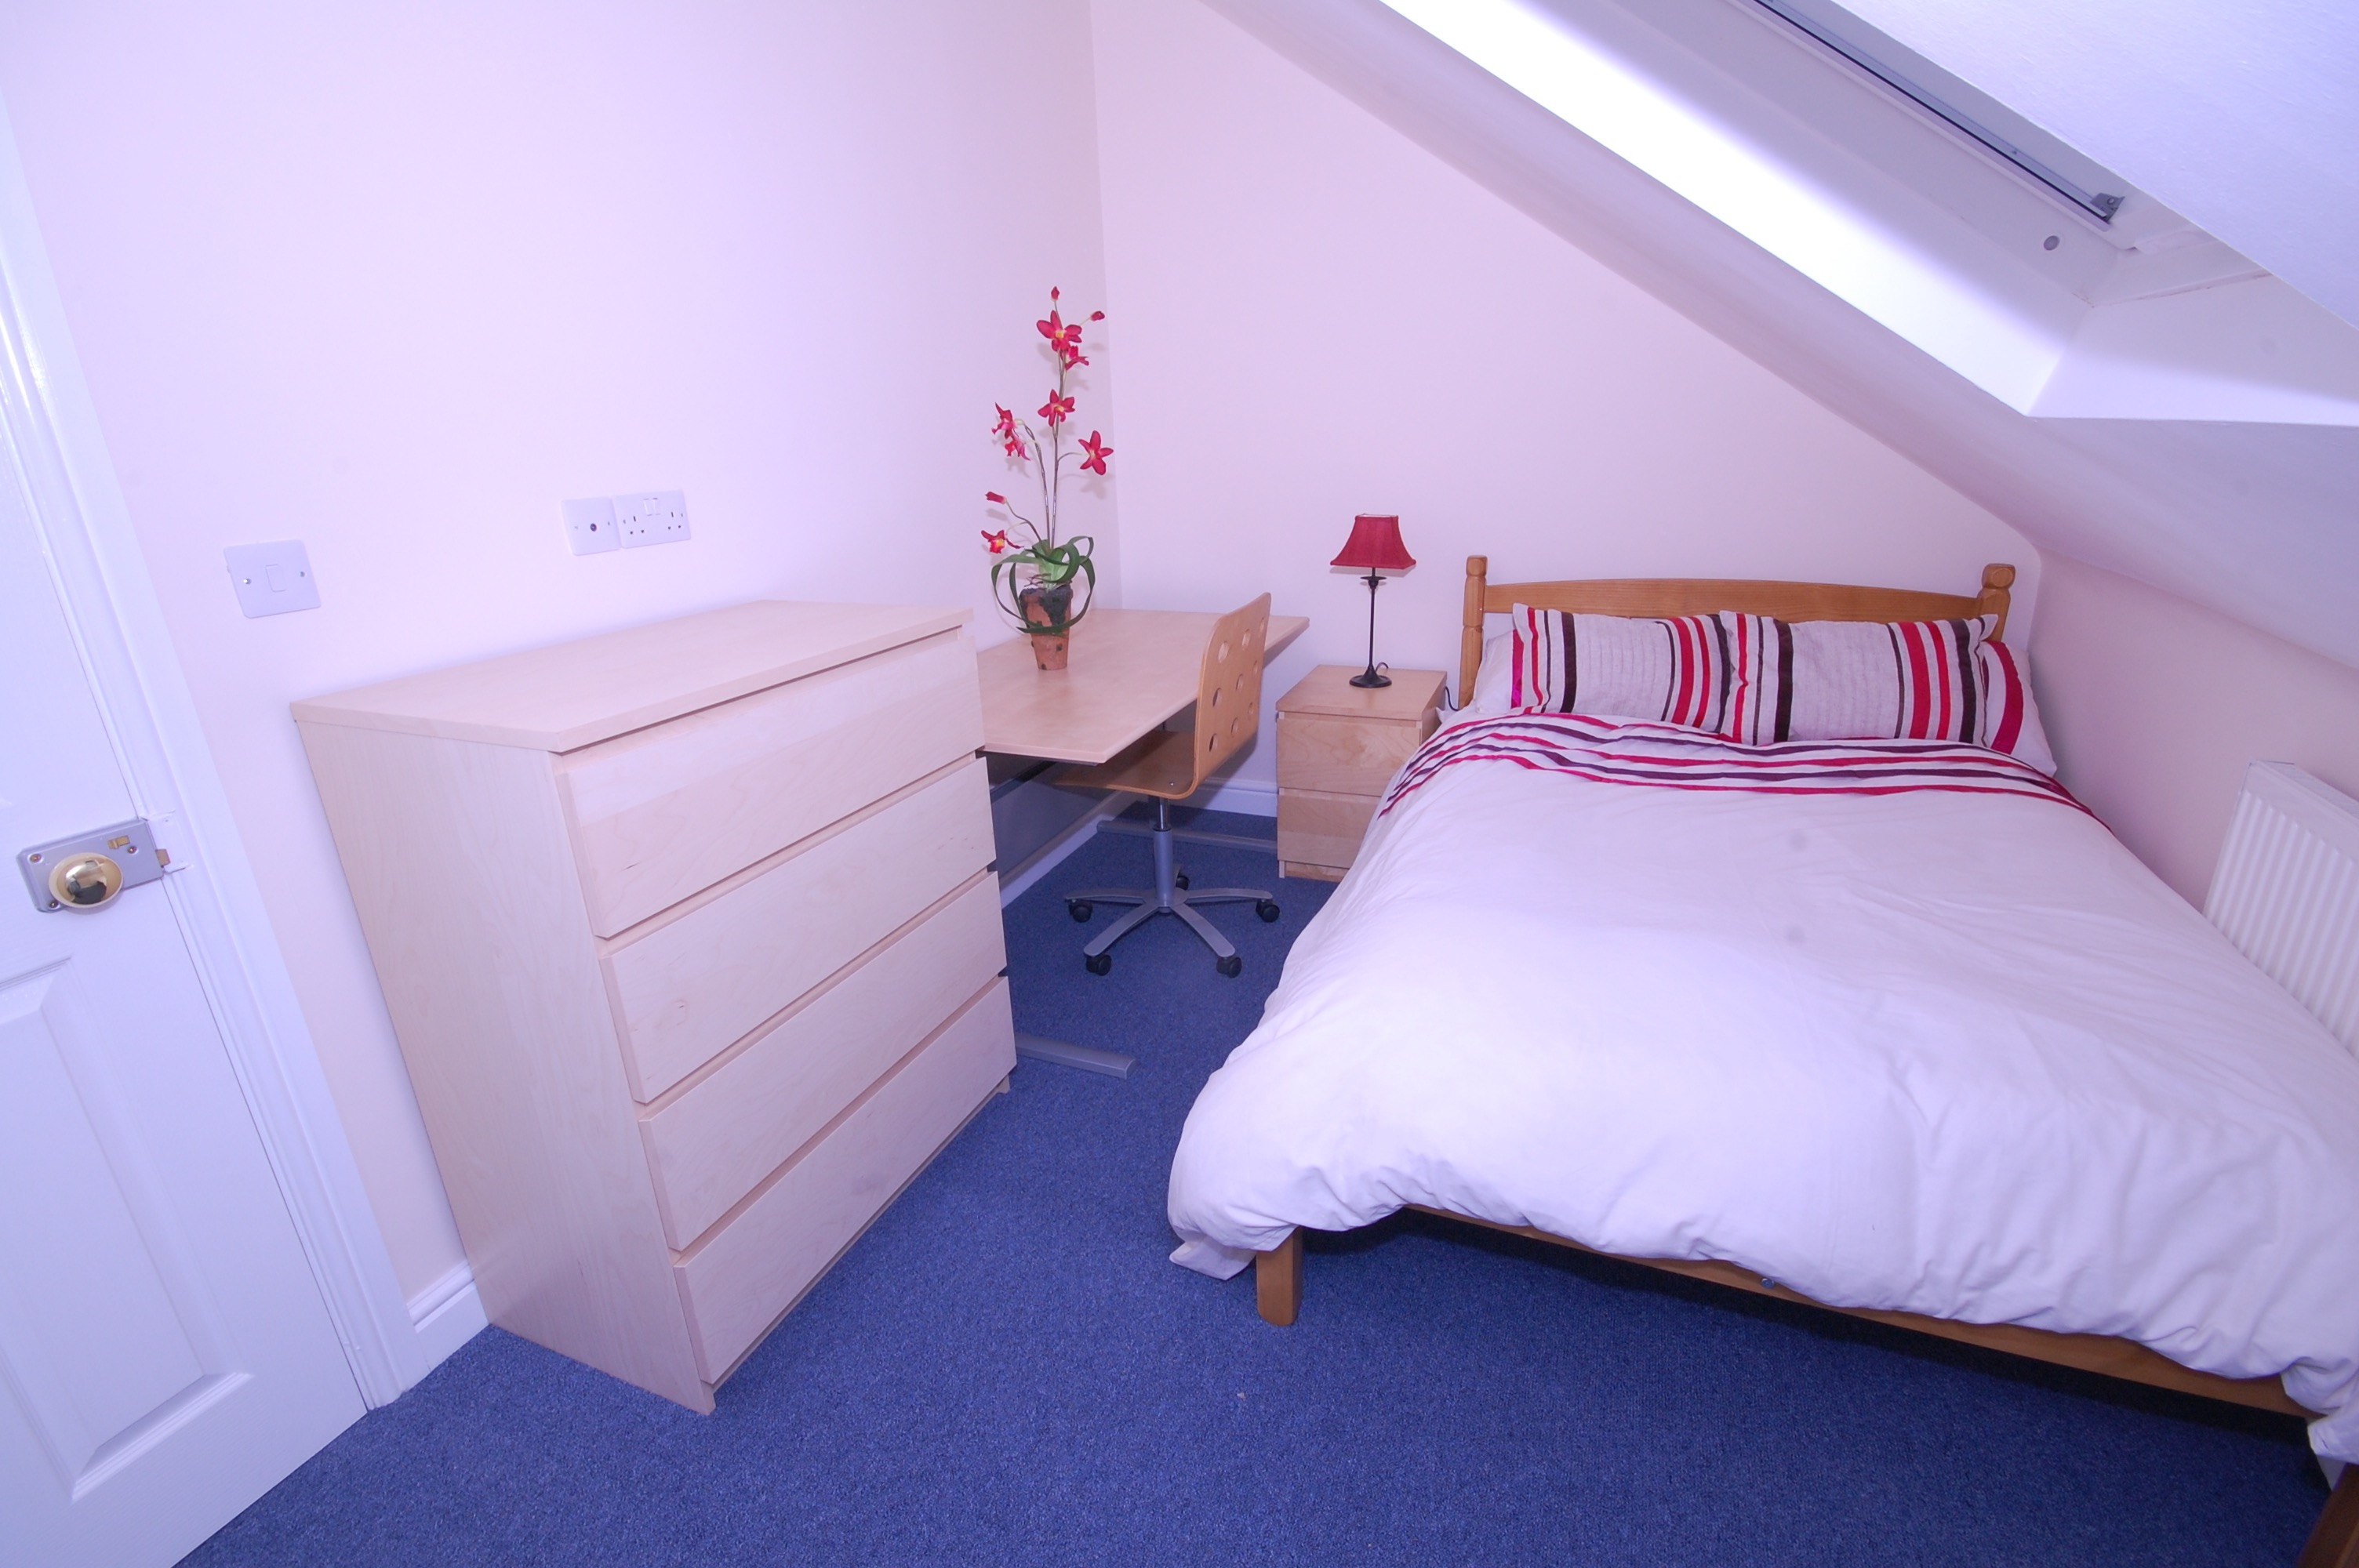 Attic Bedroom Chic Design Ideas (View 1 of 23)